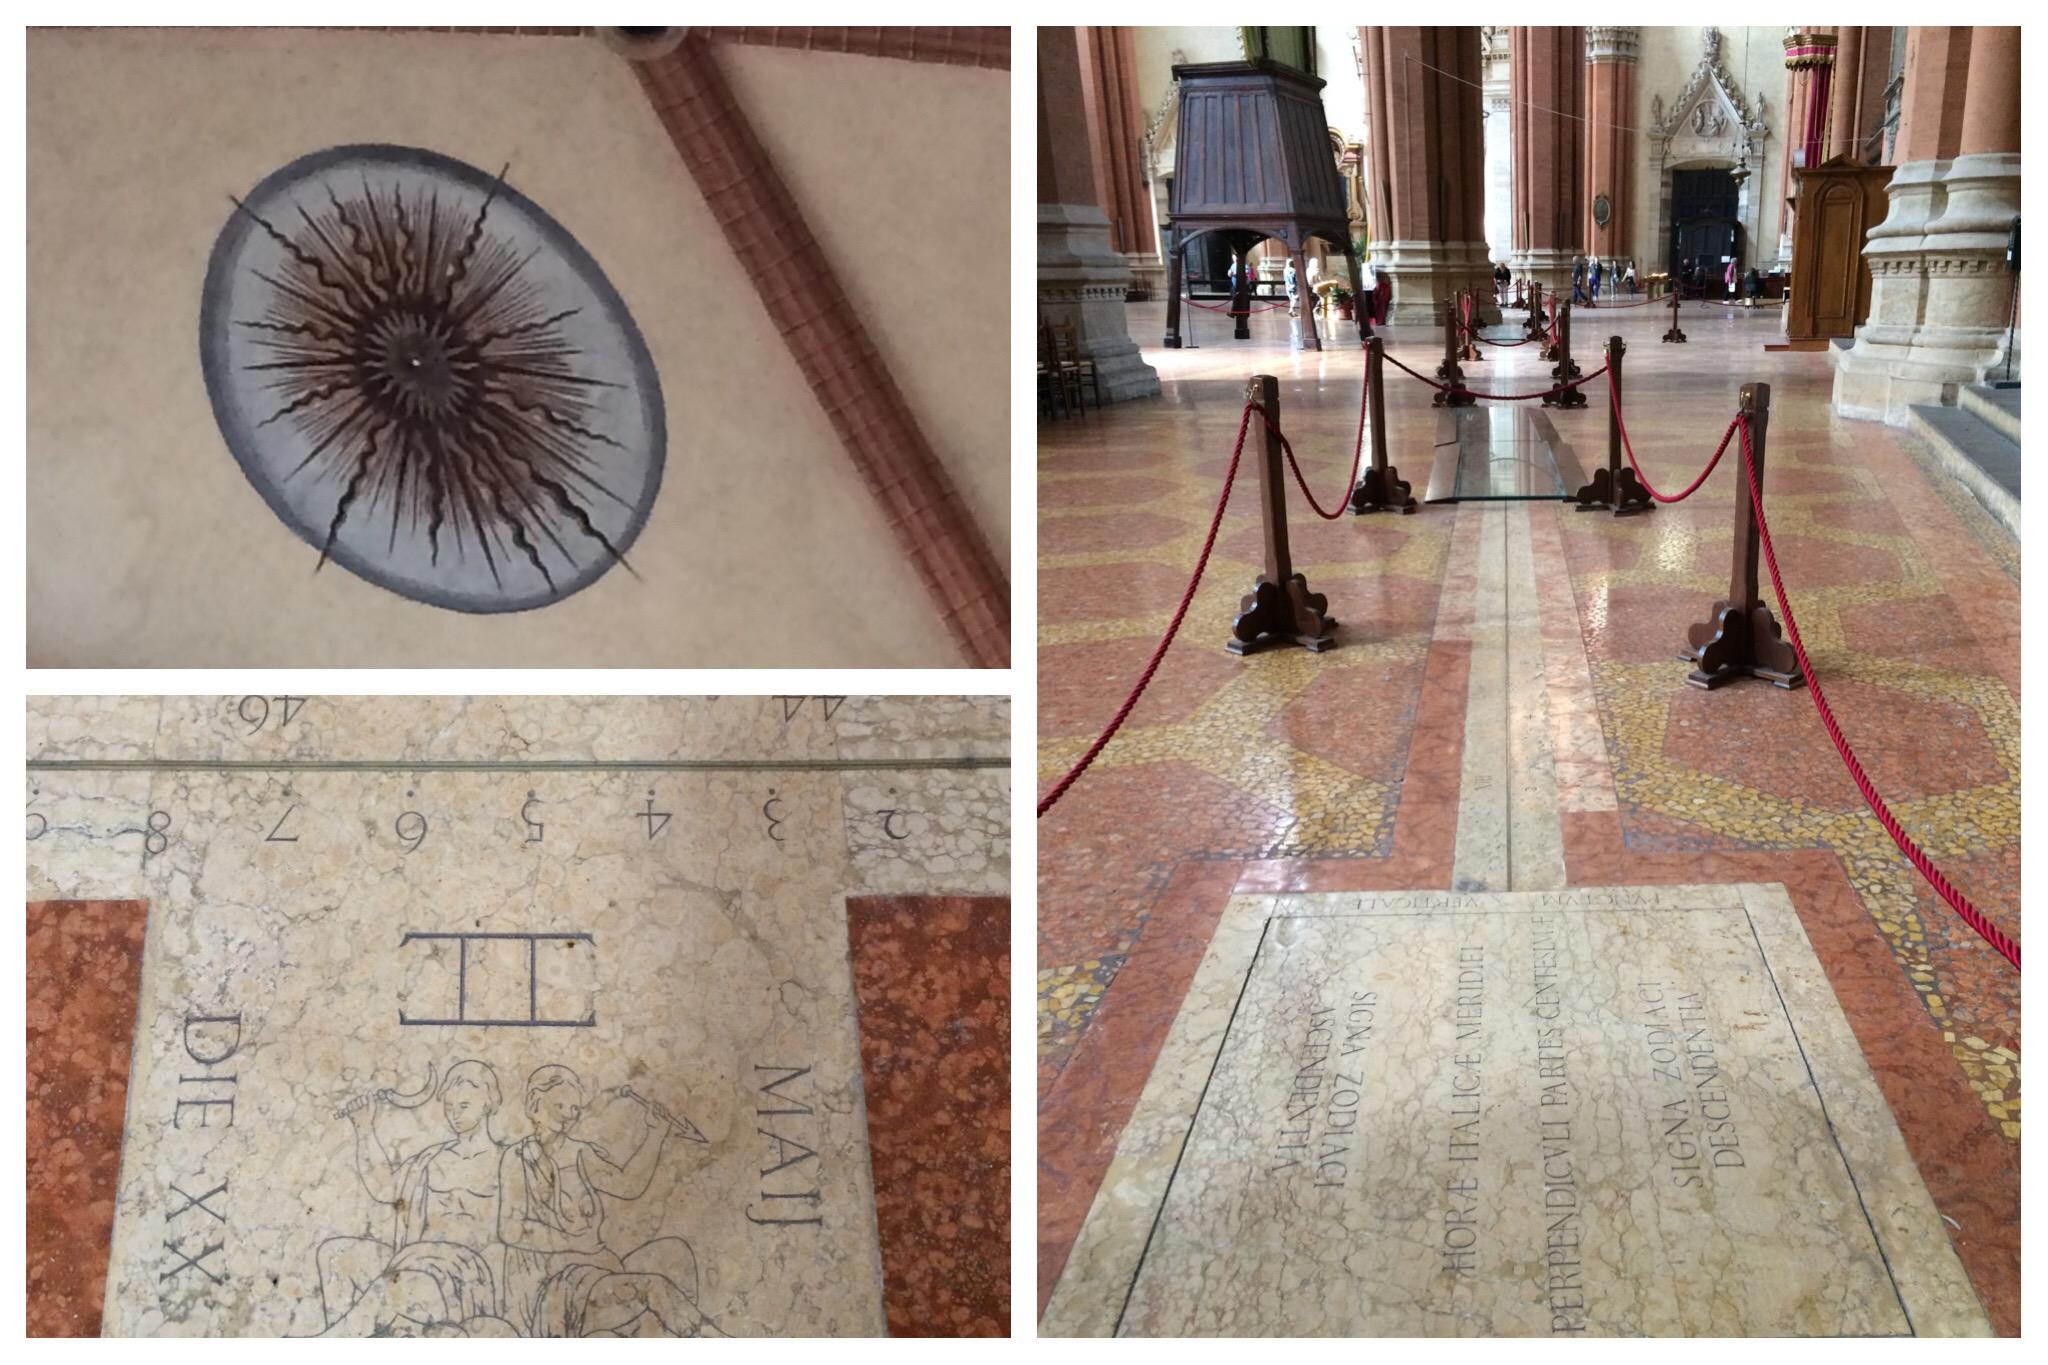 Bologna - San Petronio cathedral Cassini meridian line sundial